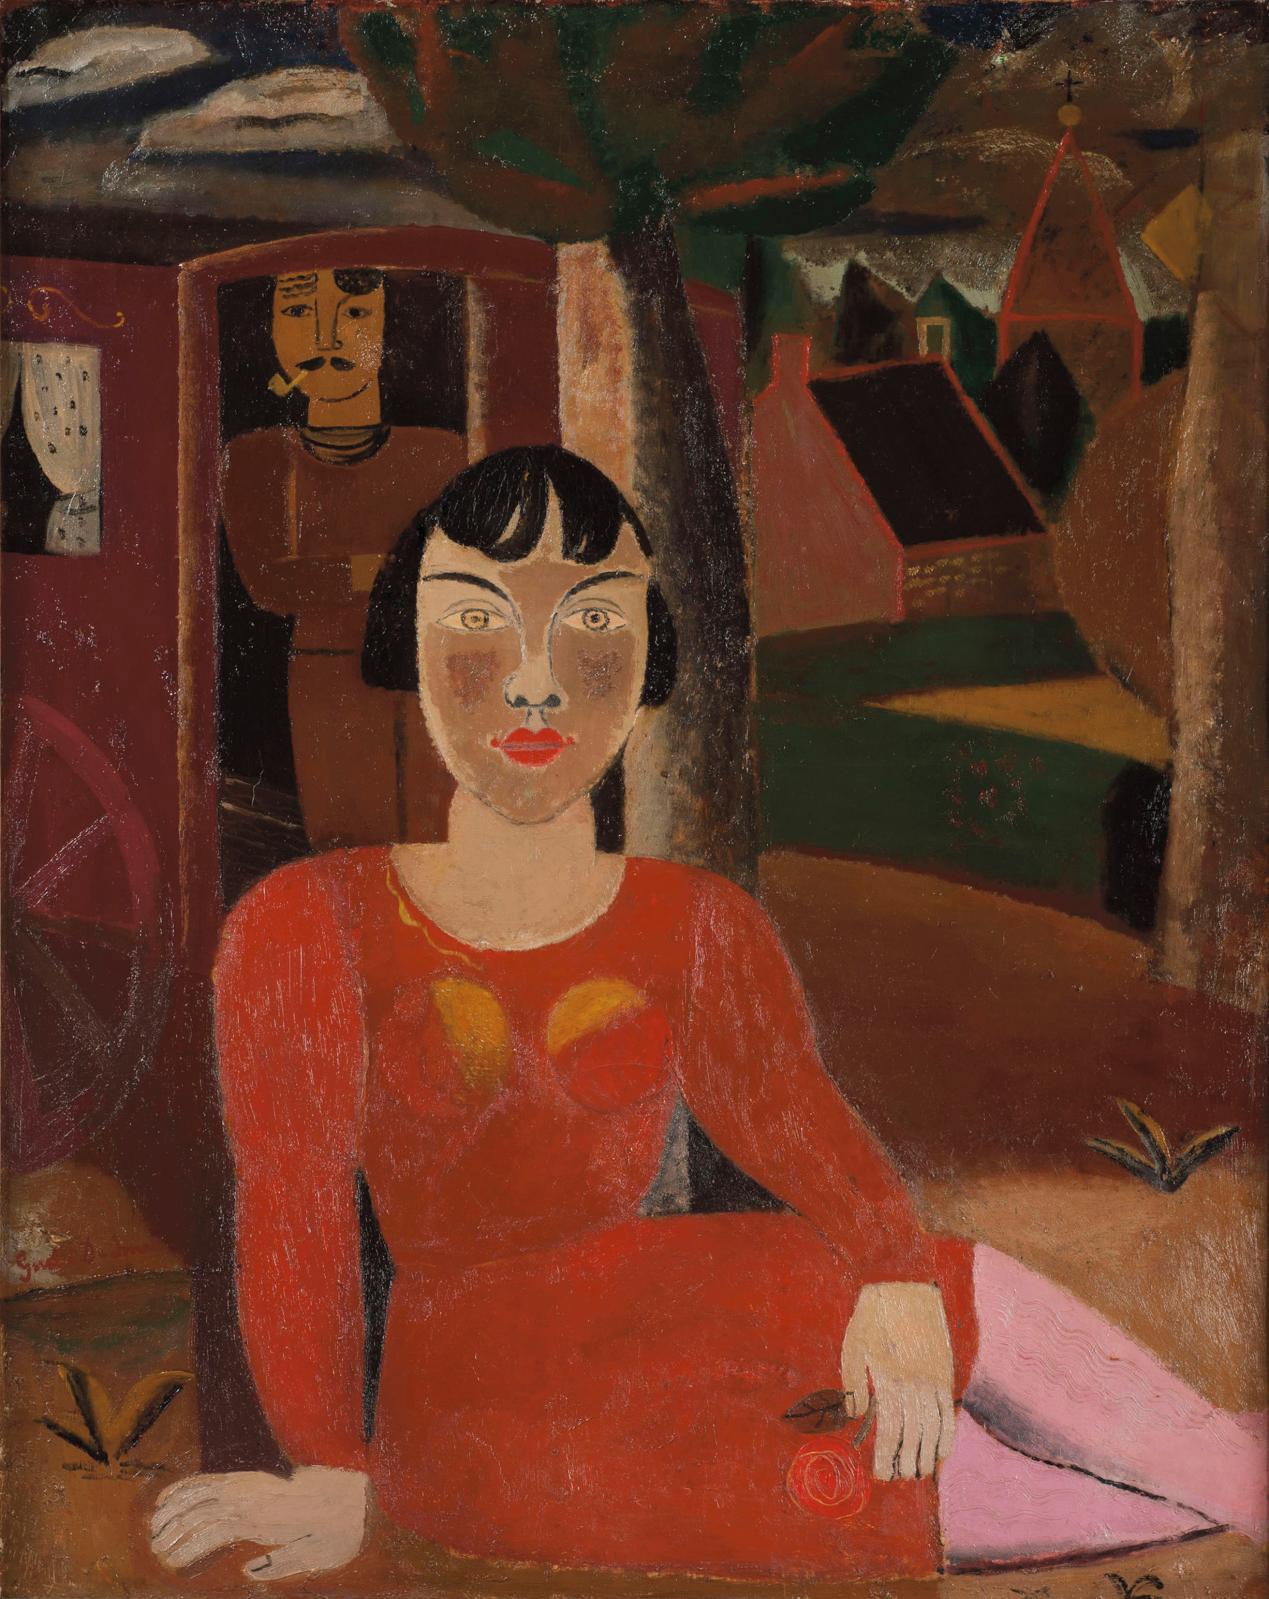 Gustave De Smet (1877-1943), La Foire (The Fair), 1928, oil on canvas, 82 x 65 cm (32.3 x 25.6 in), Galerie De Jonckheere.Courtesy of Gale